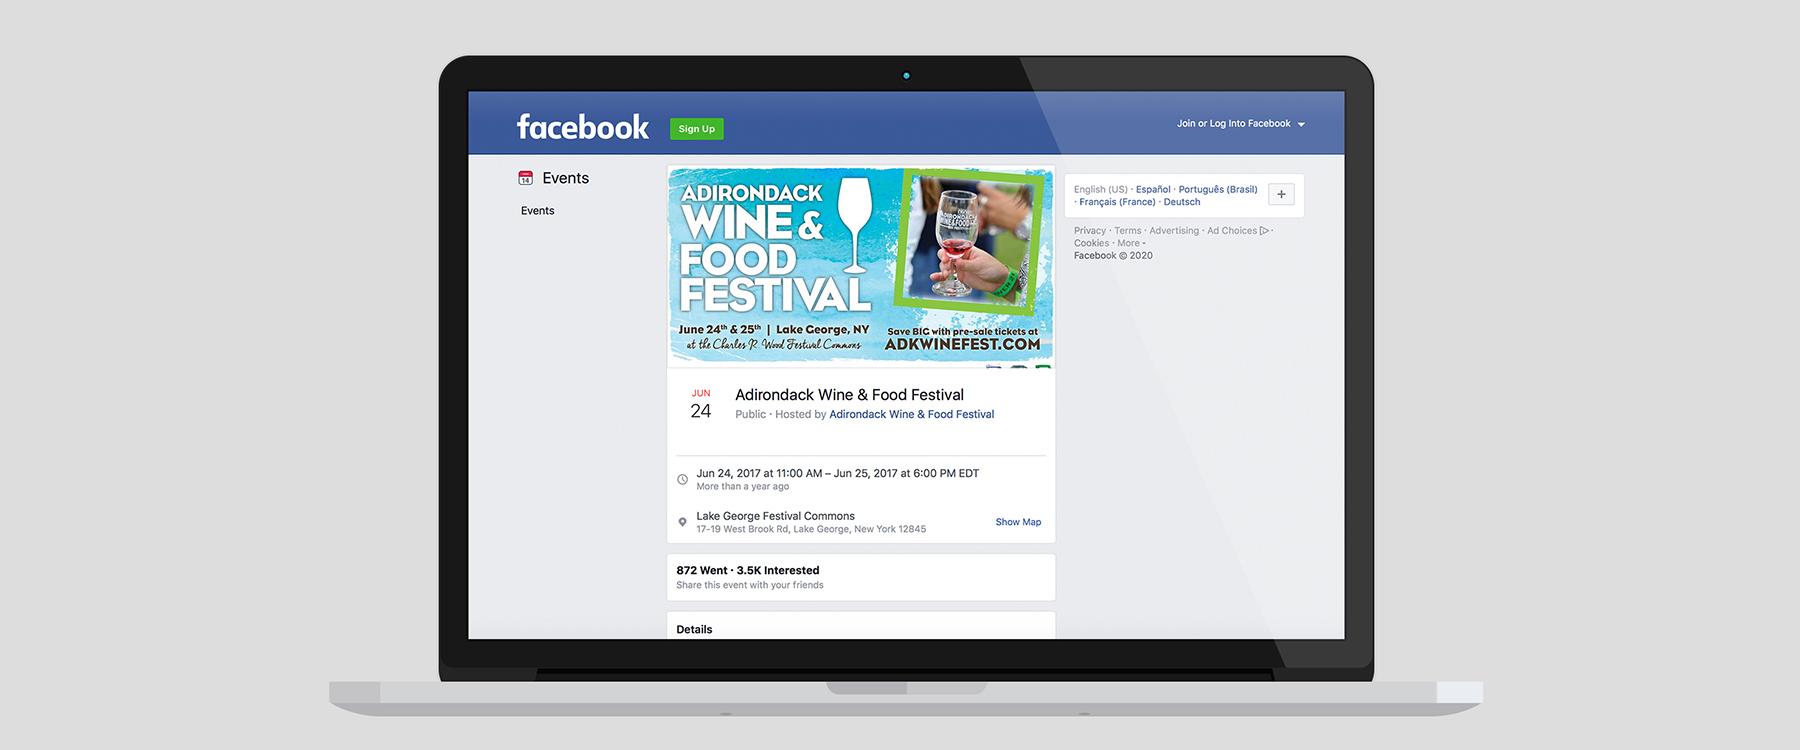 adirondack wine and food festival facebook event